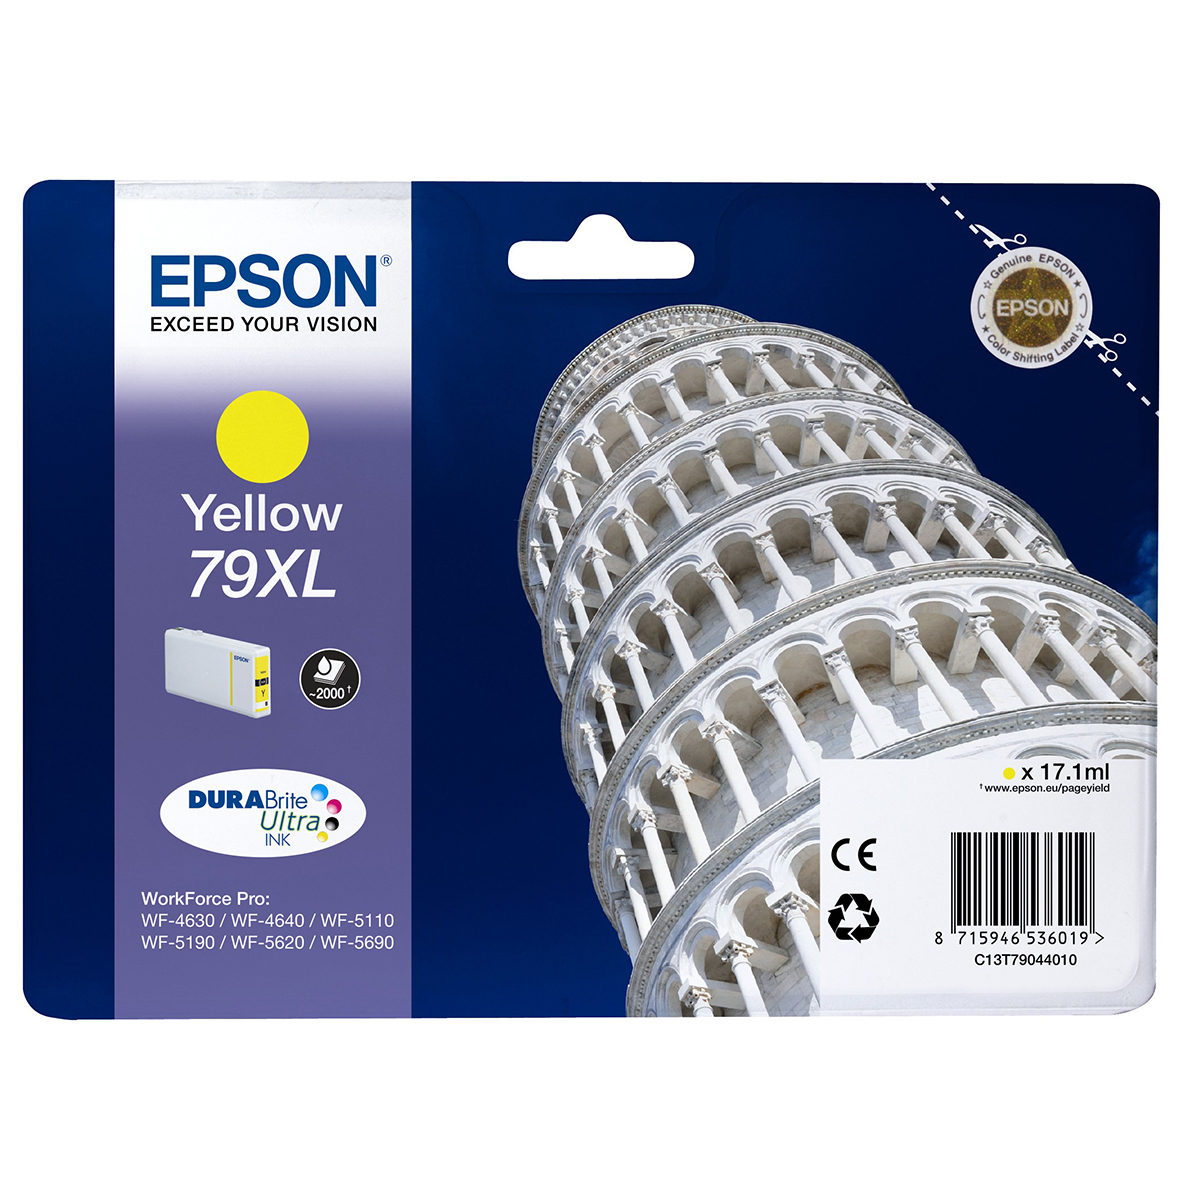 Epson 79XL Ink Cartridge Yellow